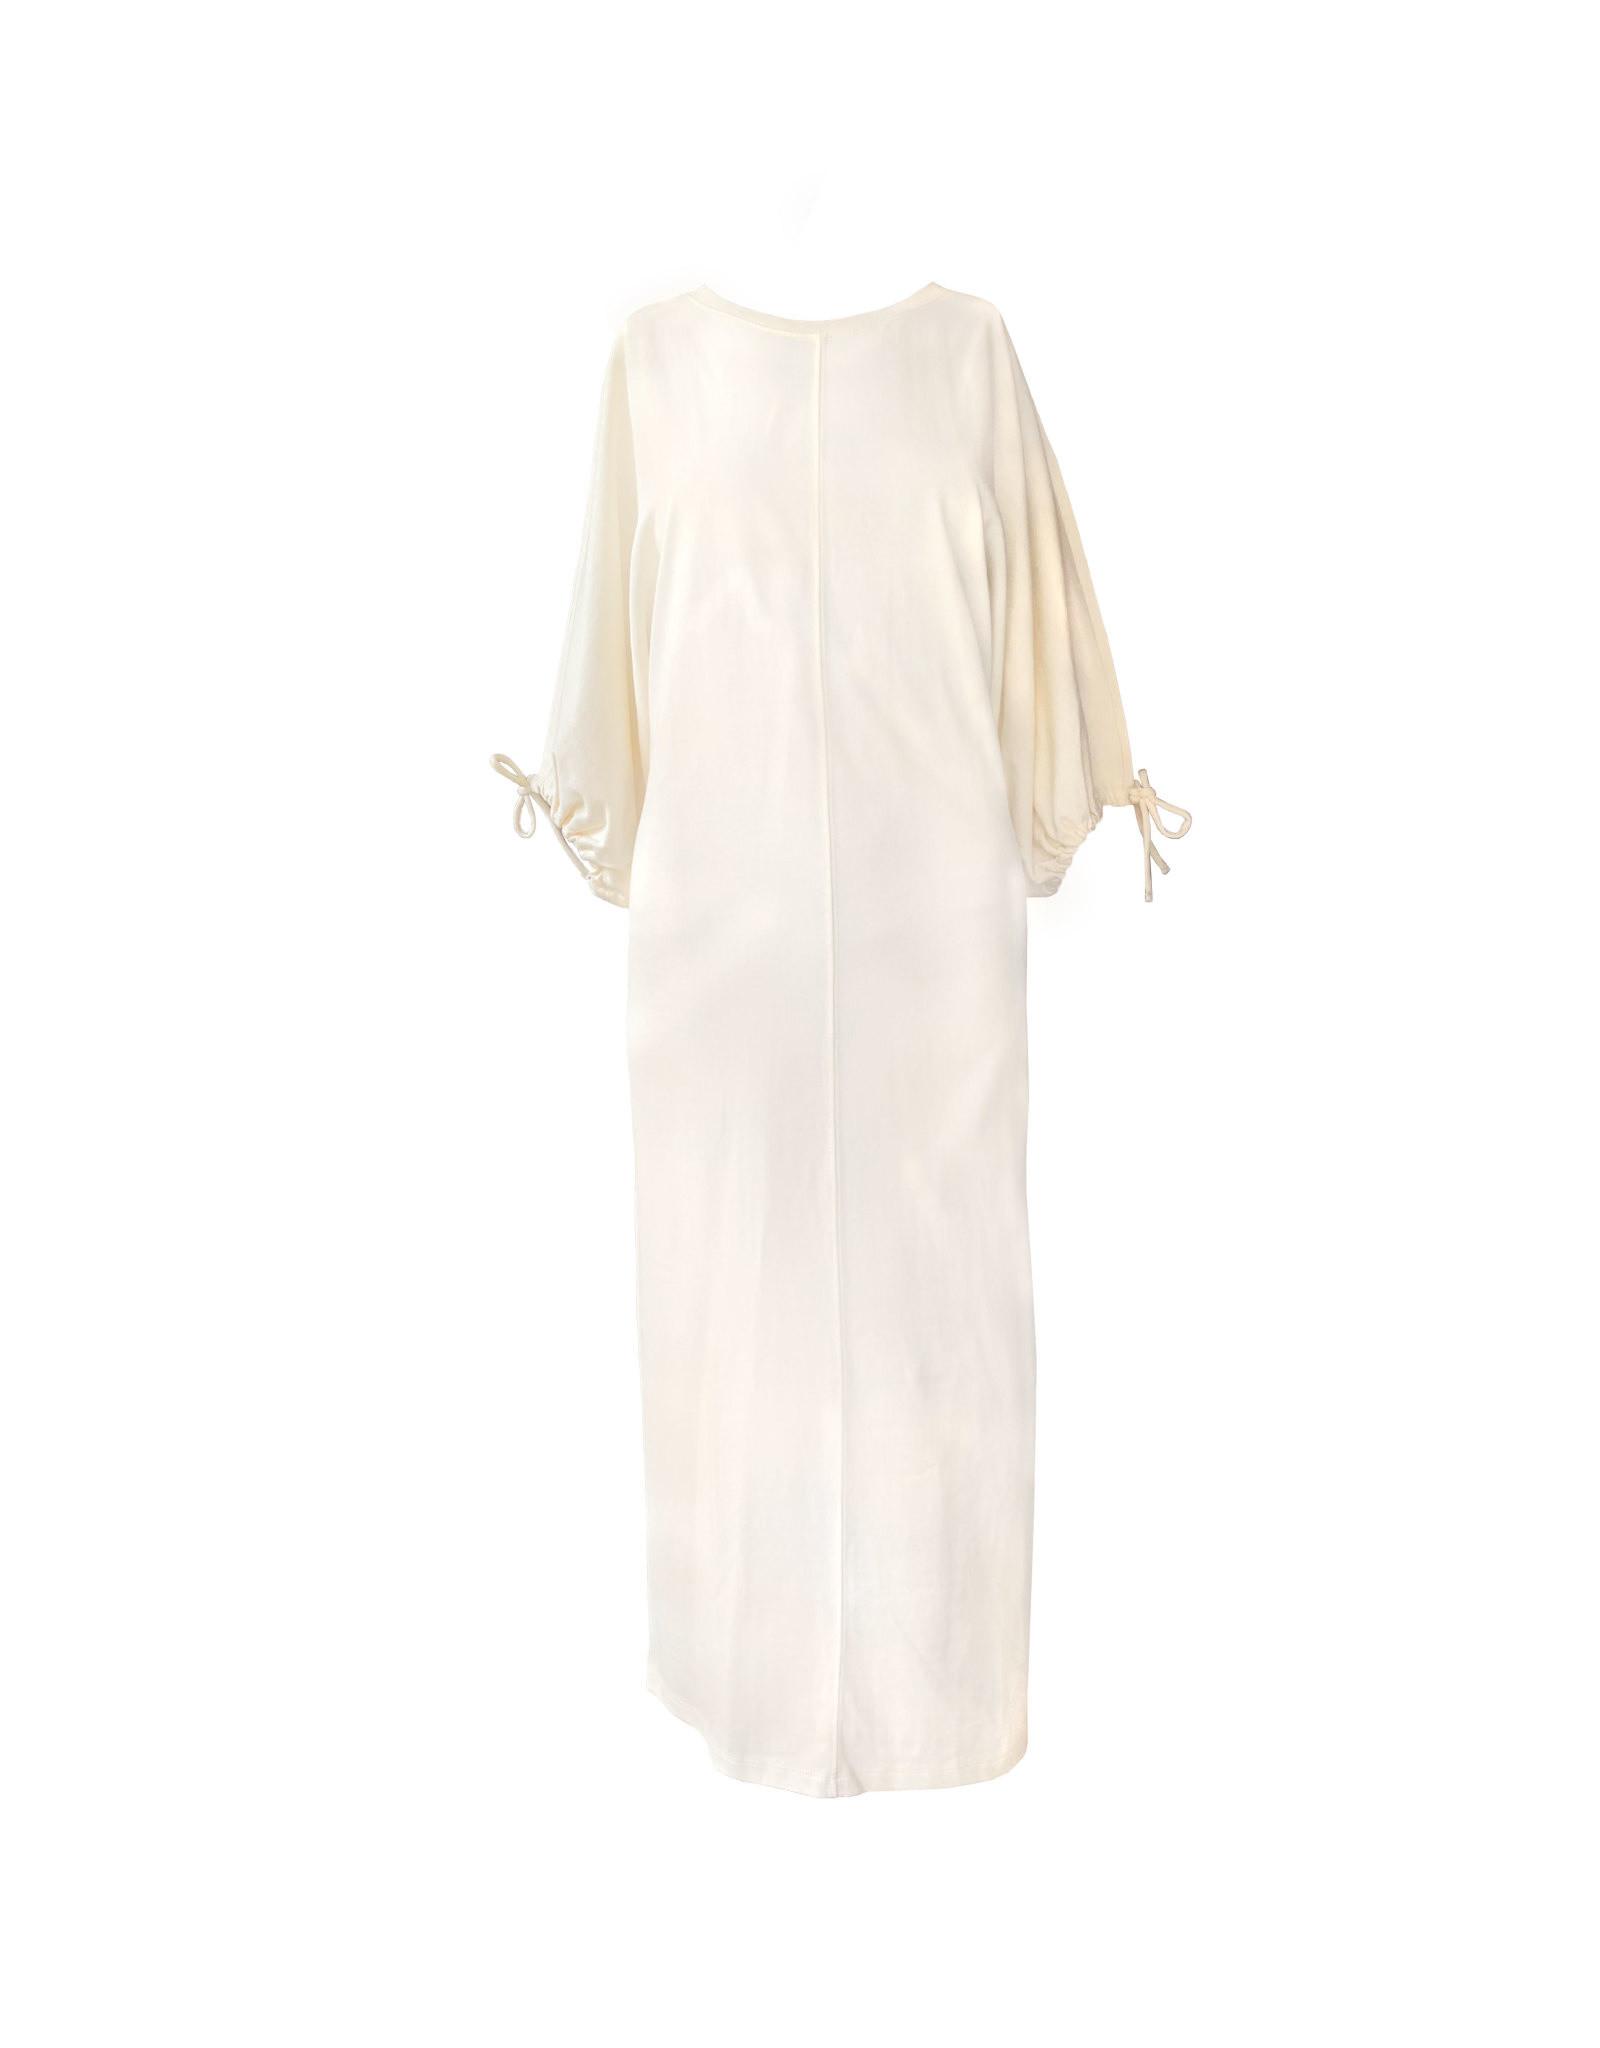 TOPSHOP TOPSHOP Ecru Drawstring  Midi Dress